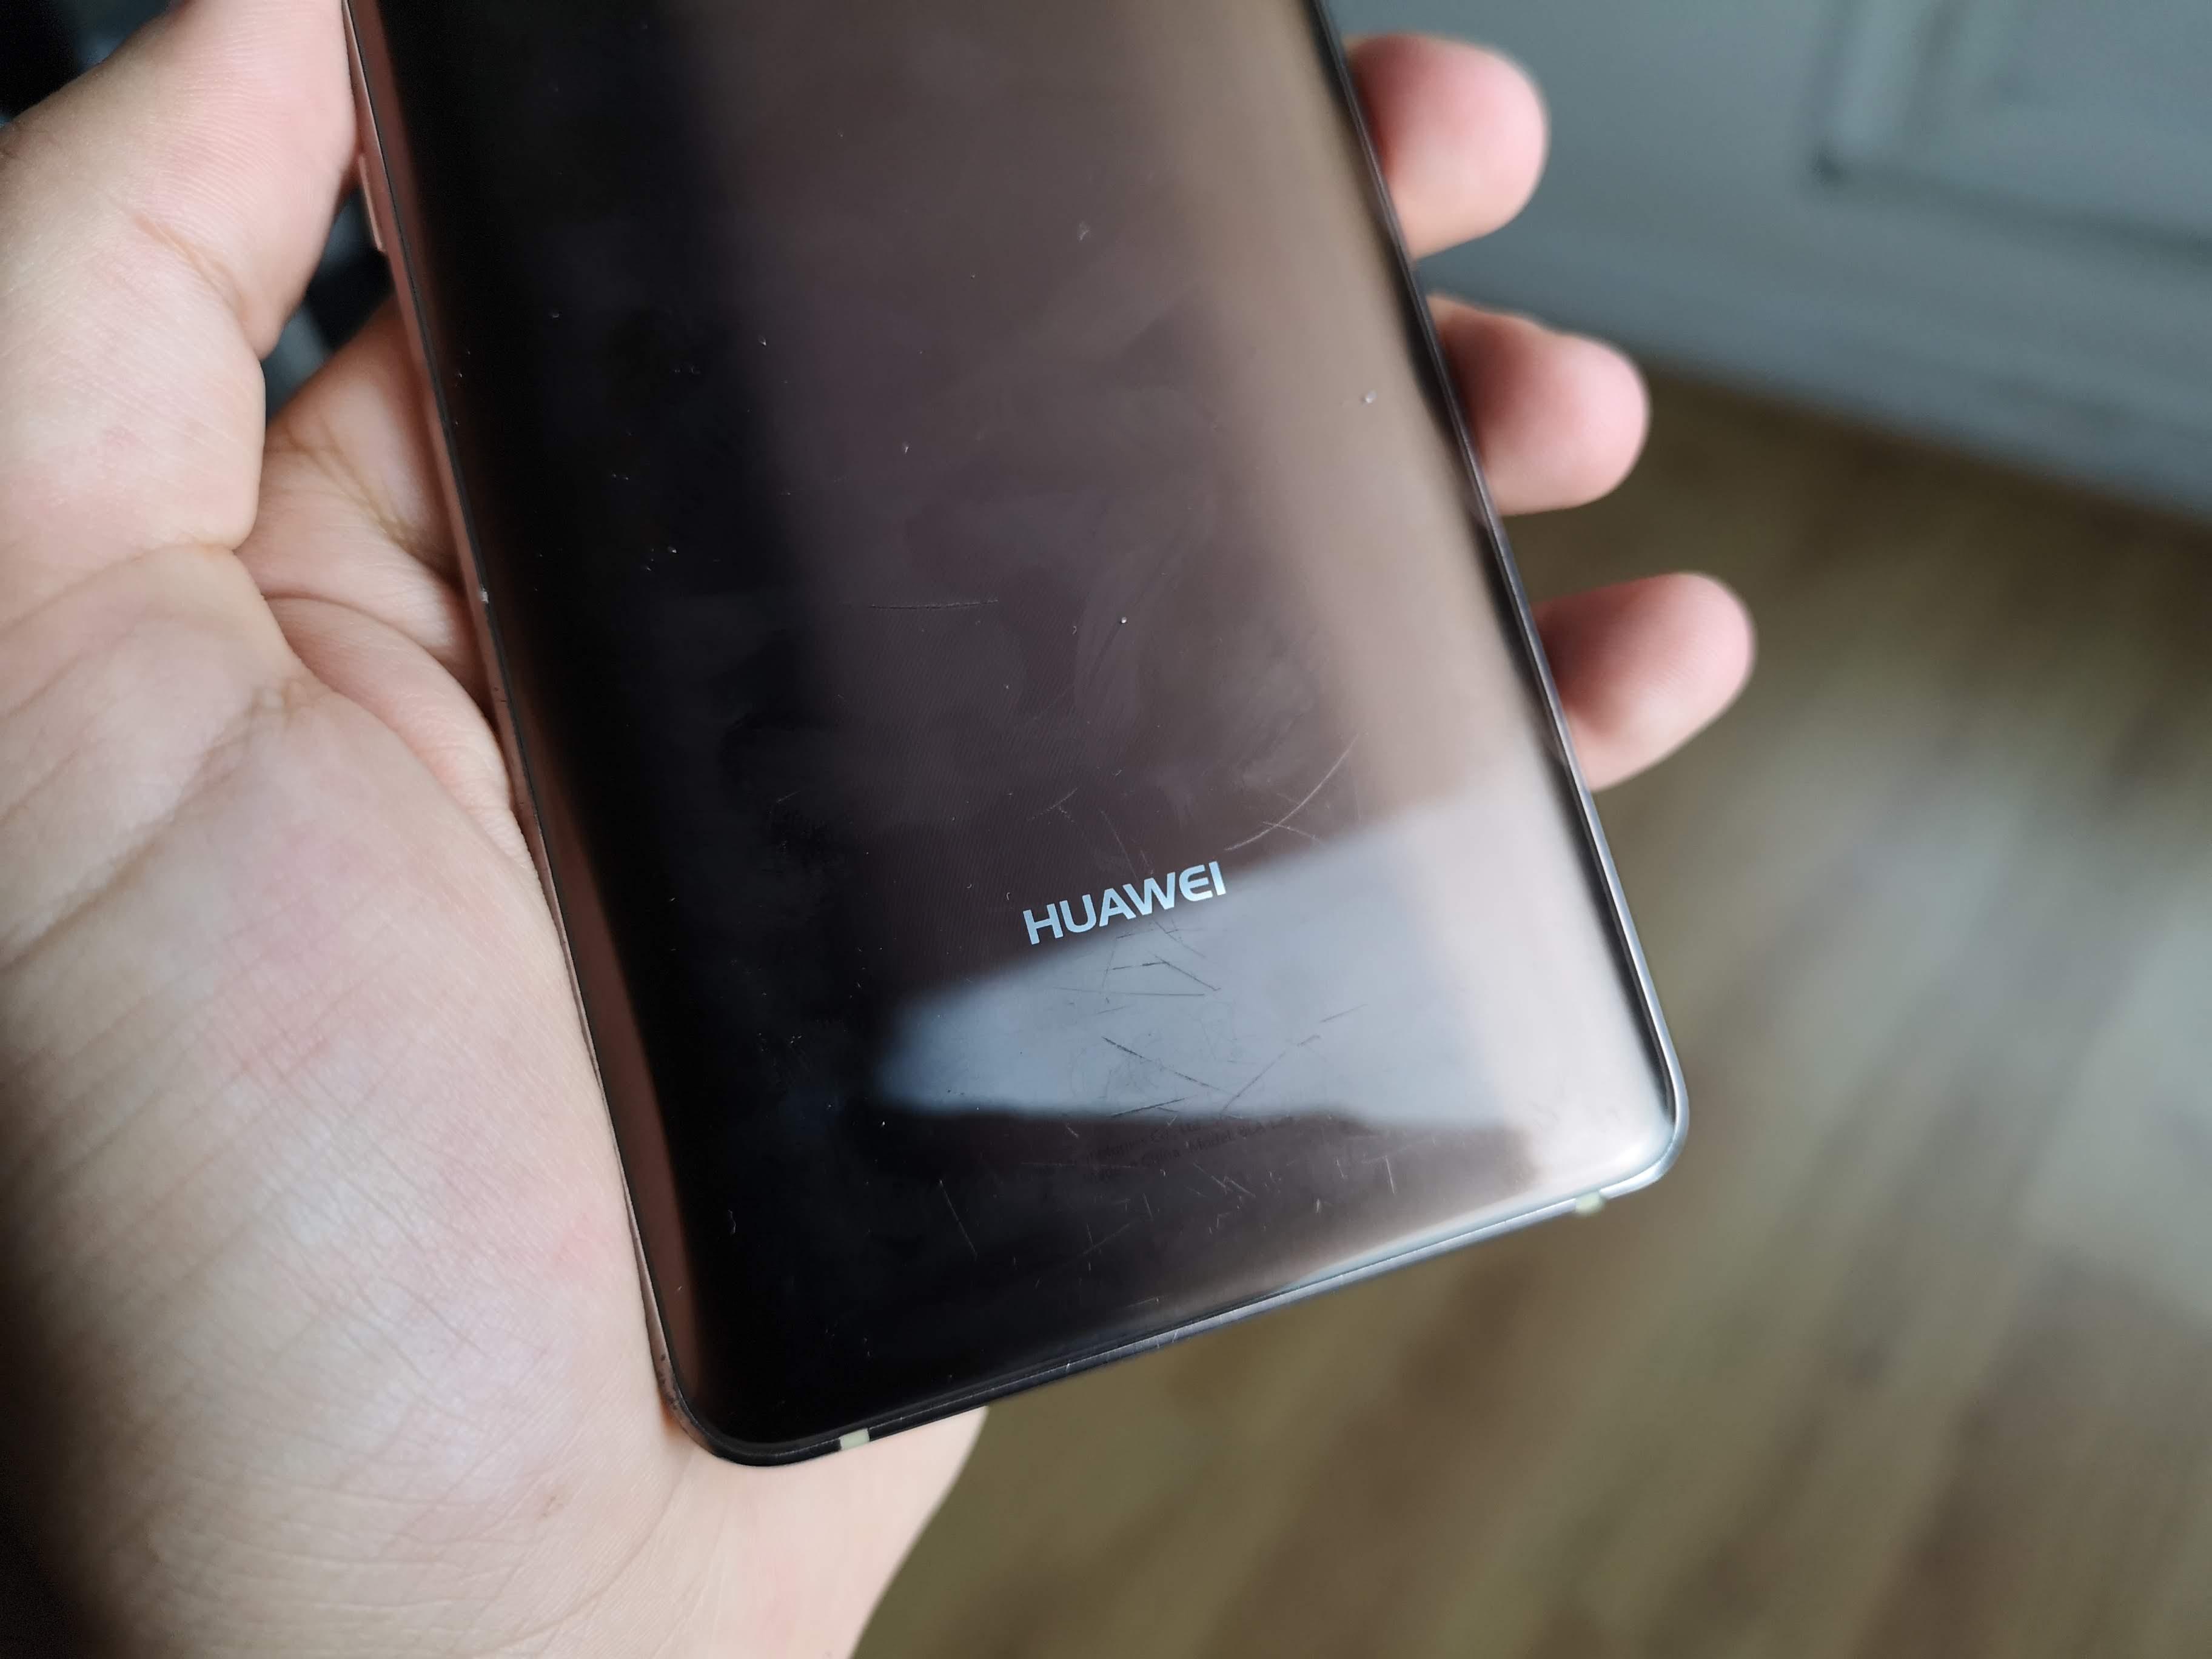 J'ai passé 8 mois avec le Huawei Mate 10 Pro : retour d